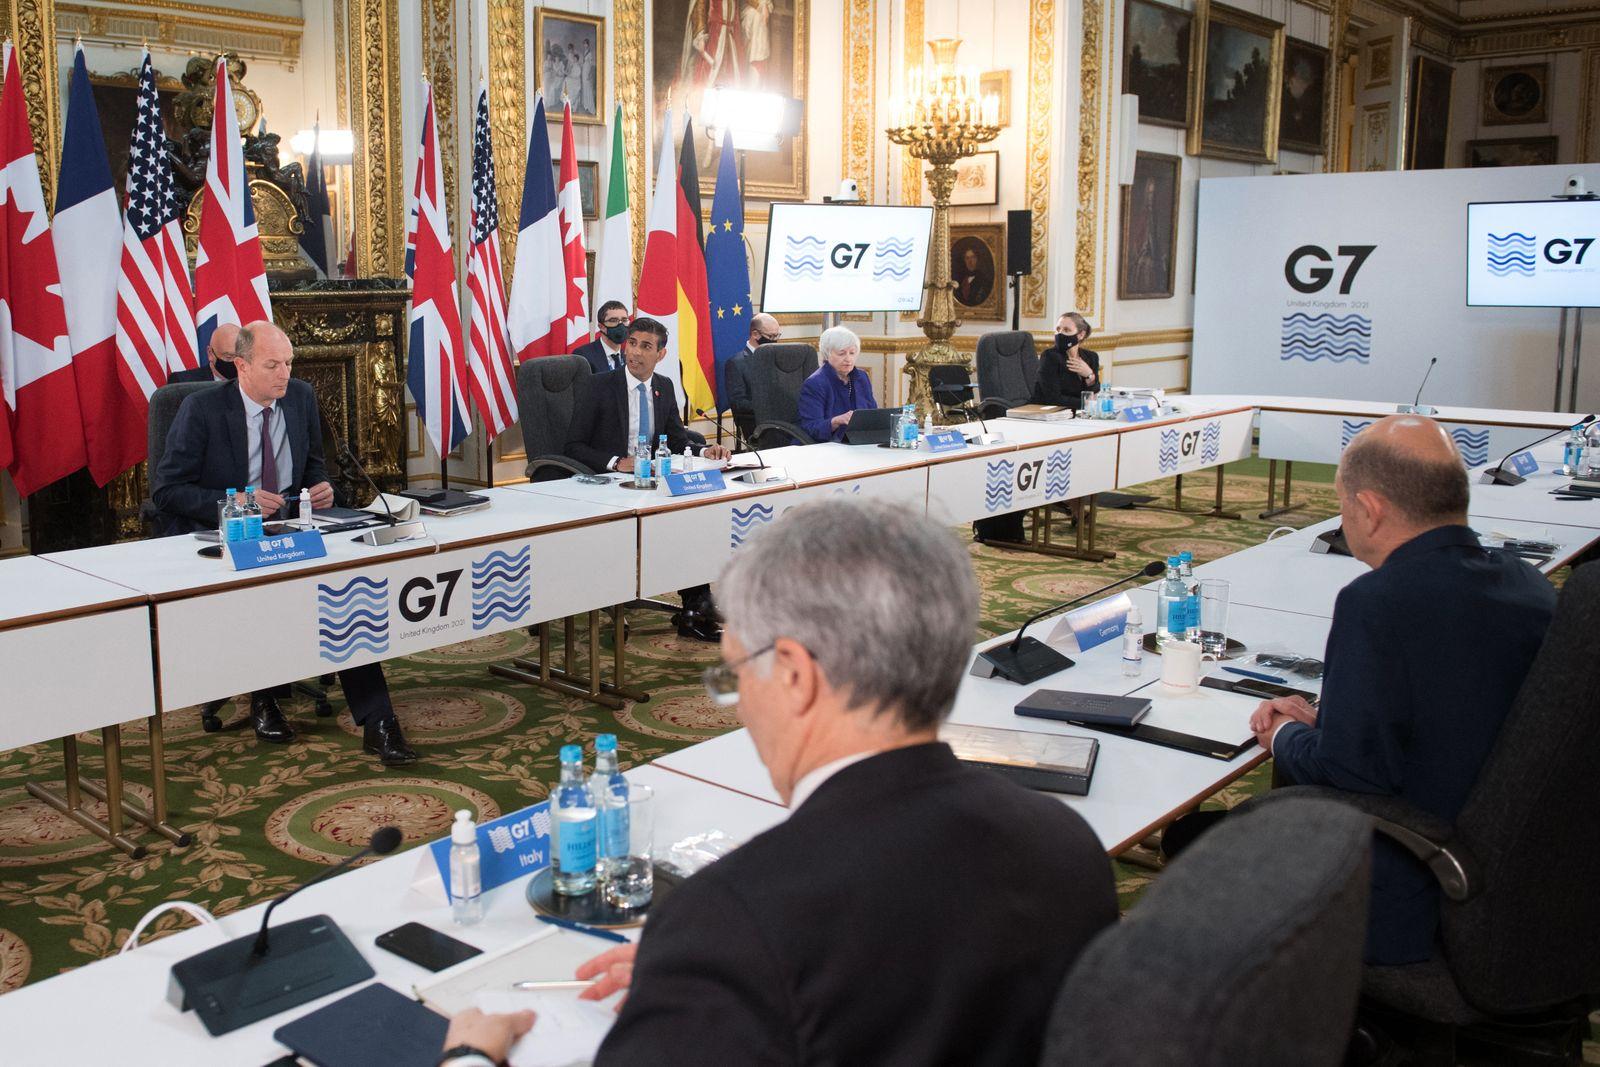 BRITAIN-G7-DIPLOMACY-FINANCE